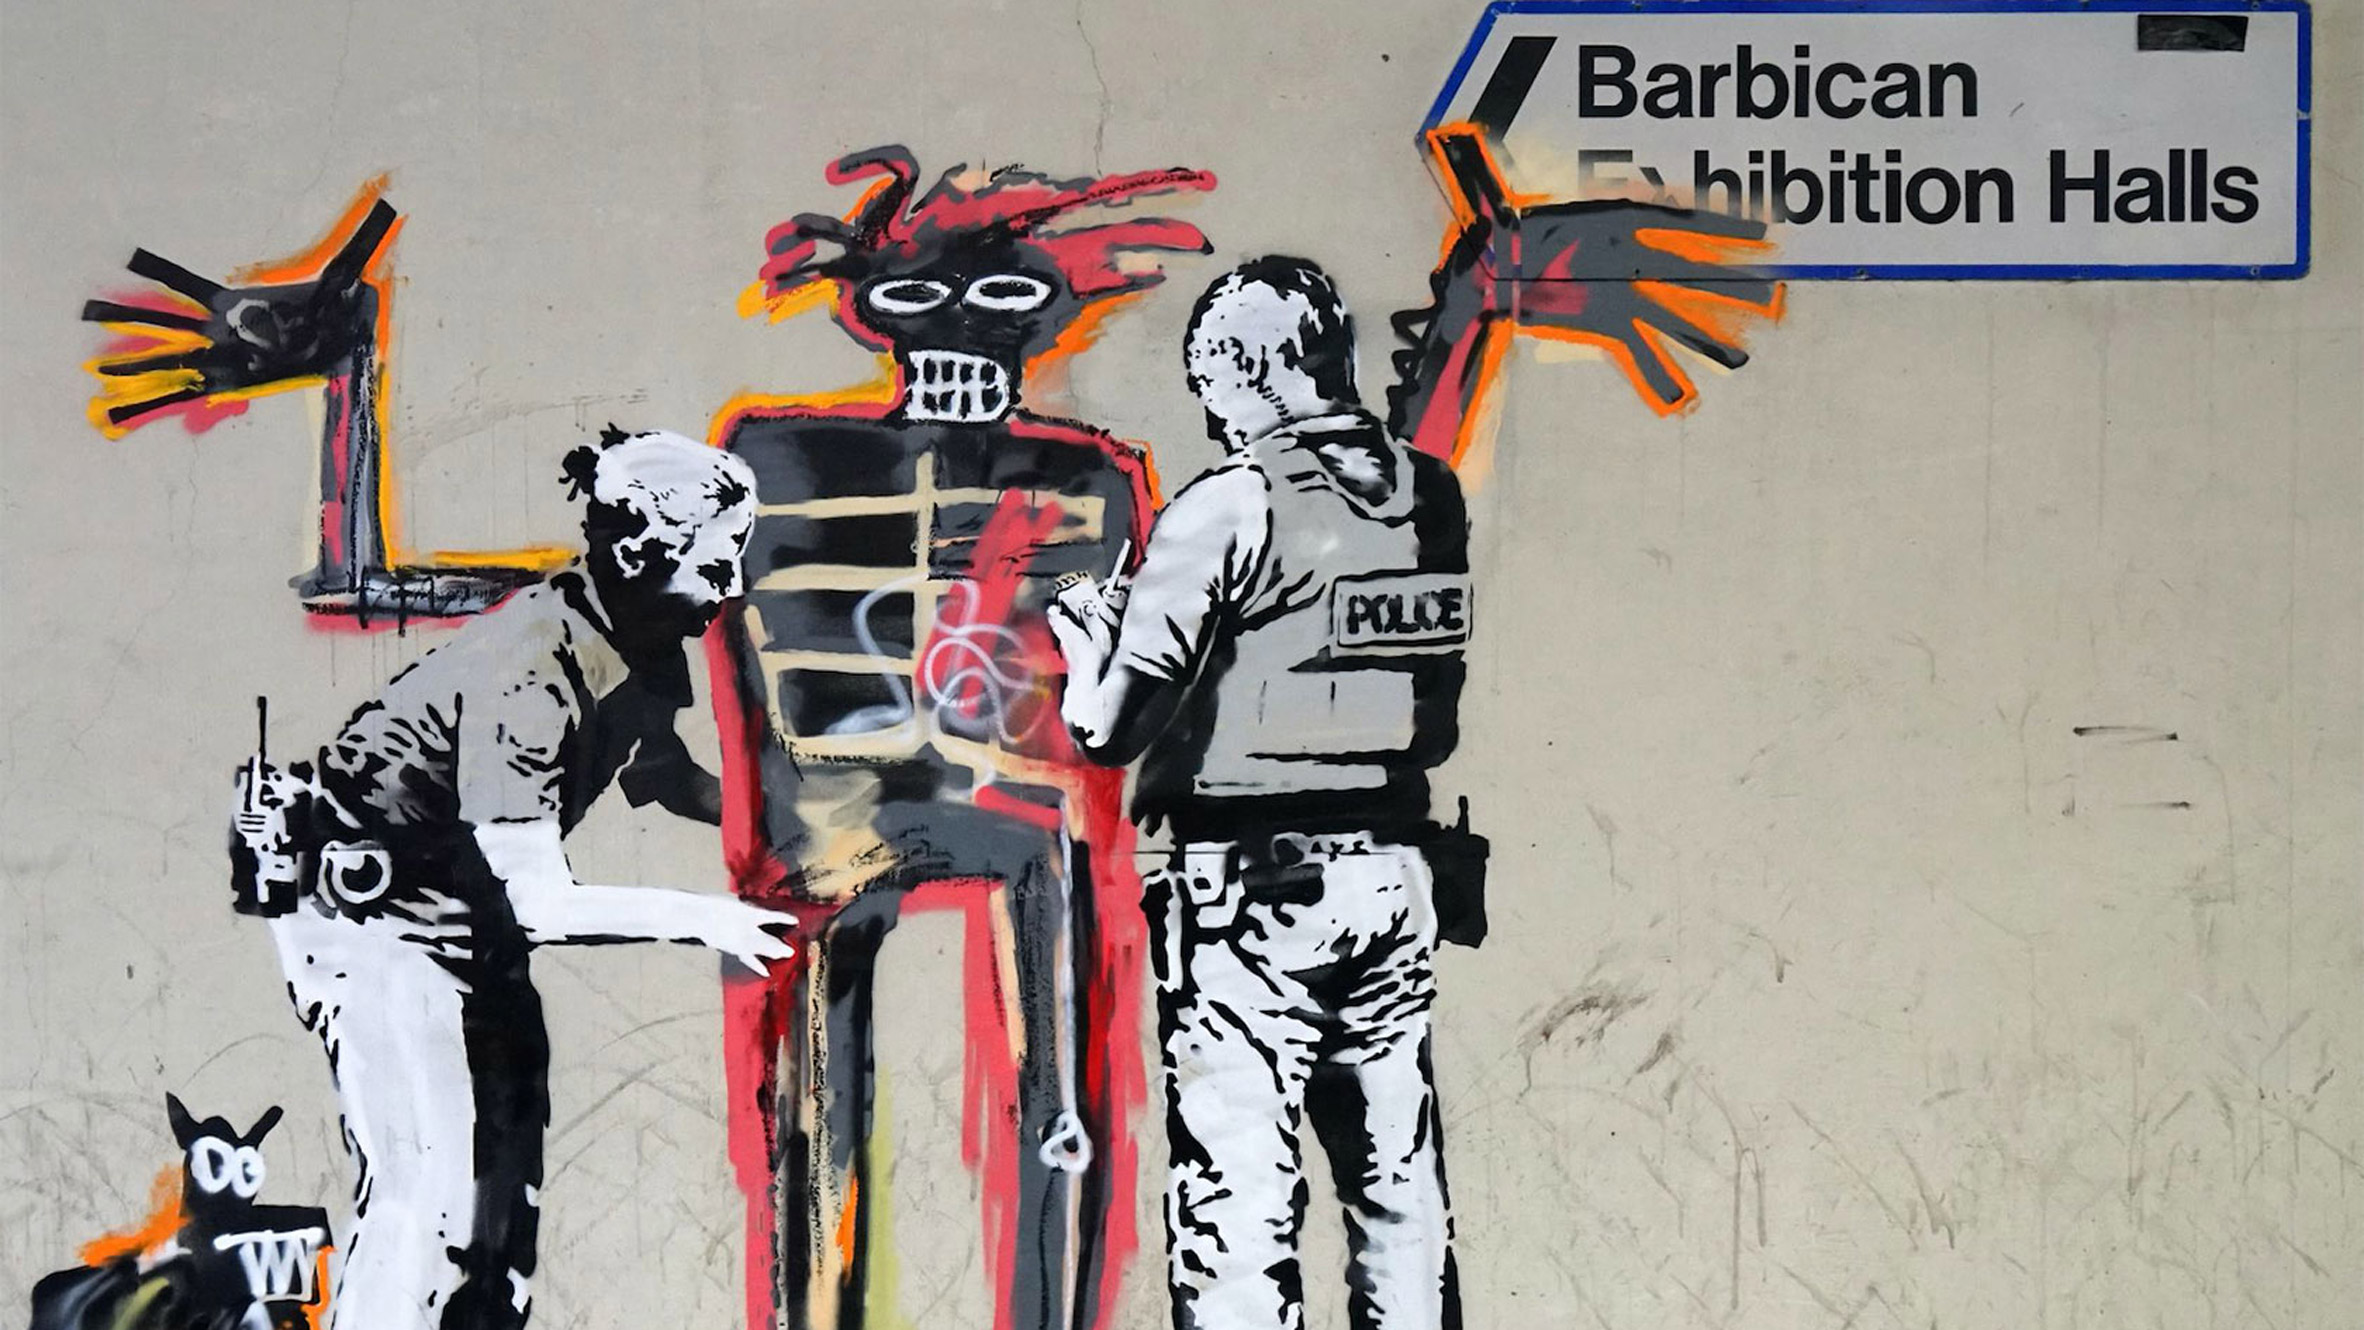 Banksy artworks appear on barbican walls ahead of basquiat exhibition